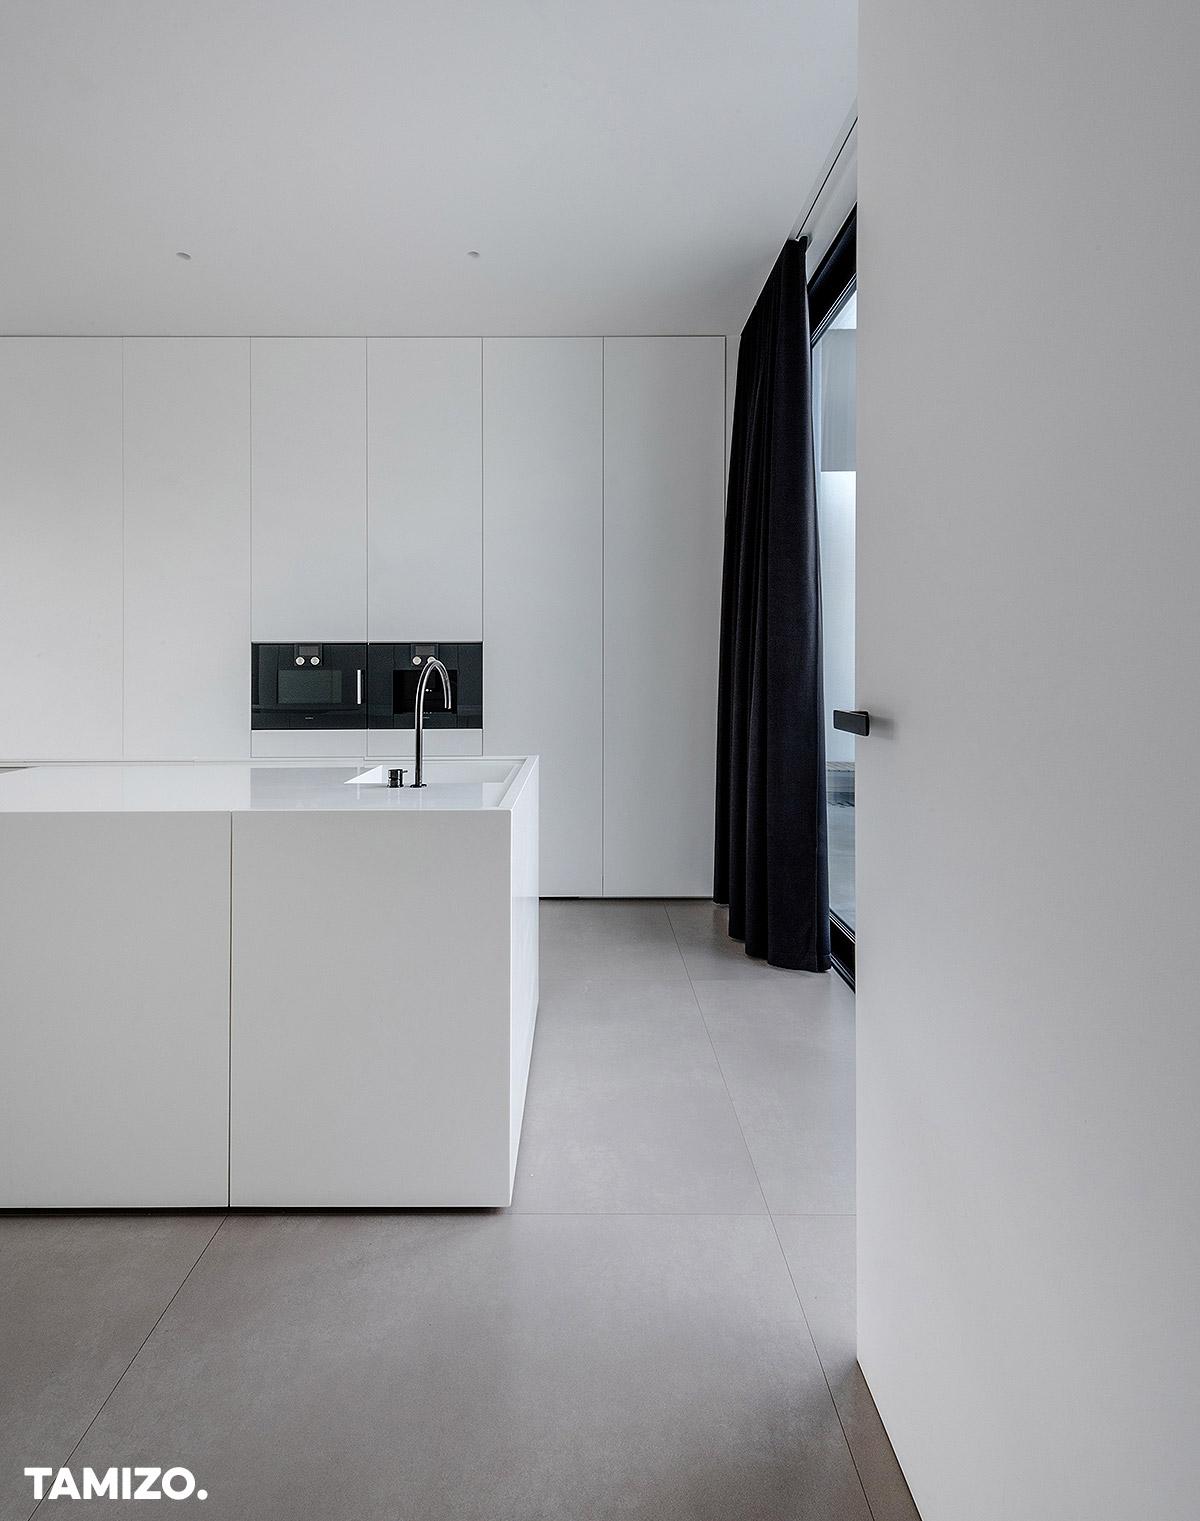 022_tamizo_architects_interior_house_realization_warsaw_poland_35